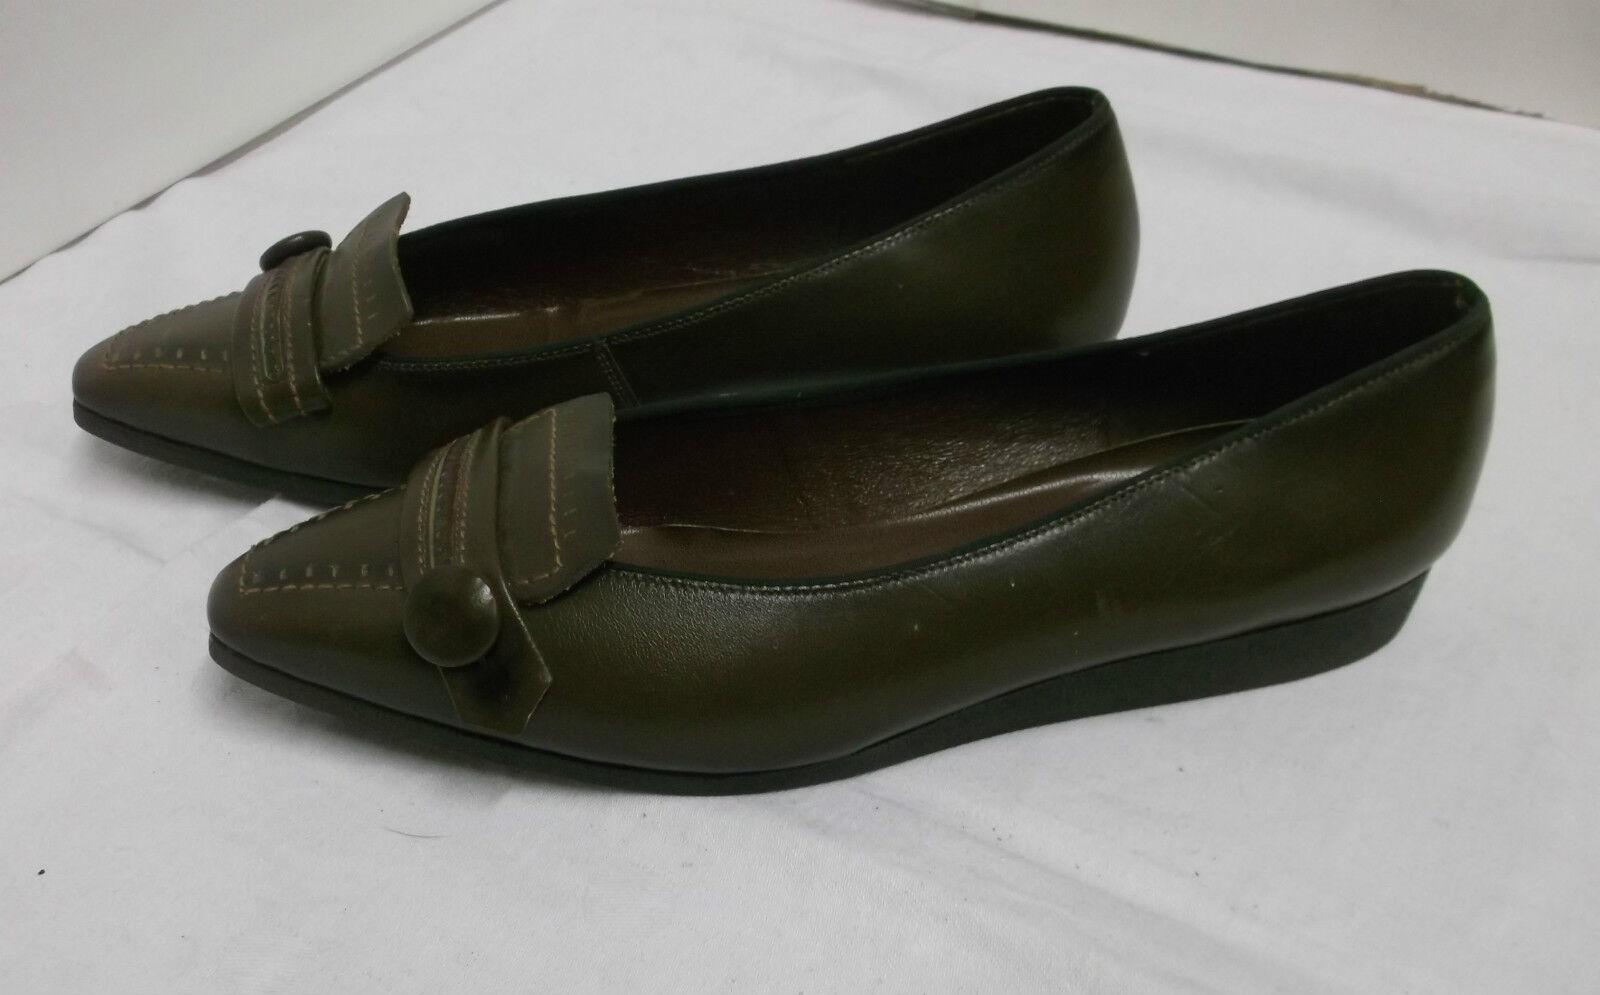 60er NOS Scarpe da Donna Marronee Ballerina mattil GERMANY TG. 35,5 VINTAGE scarpe 60s